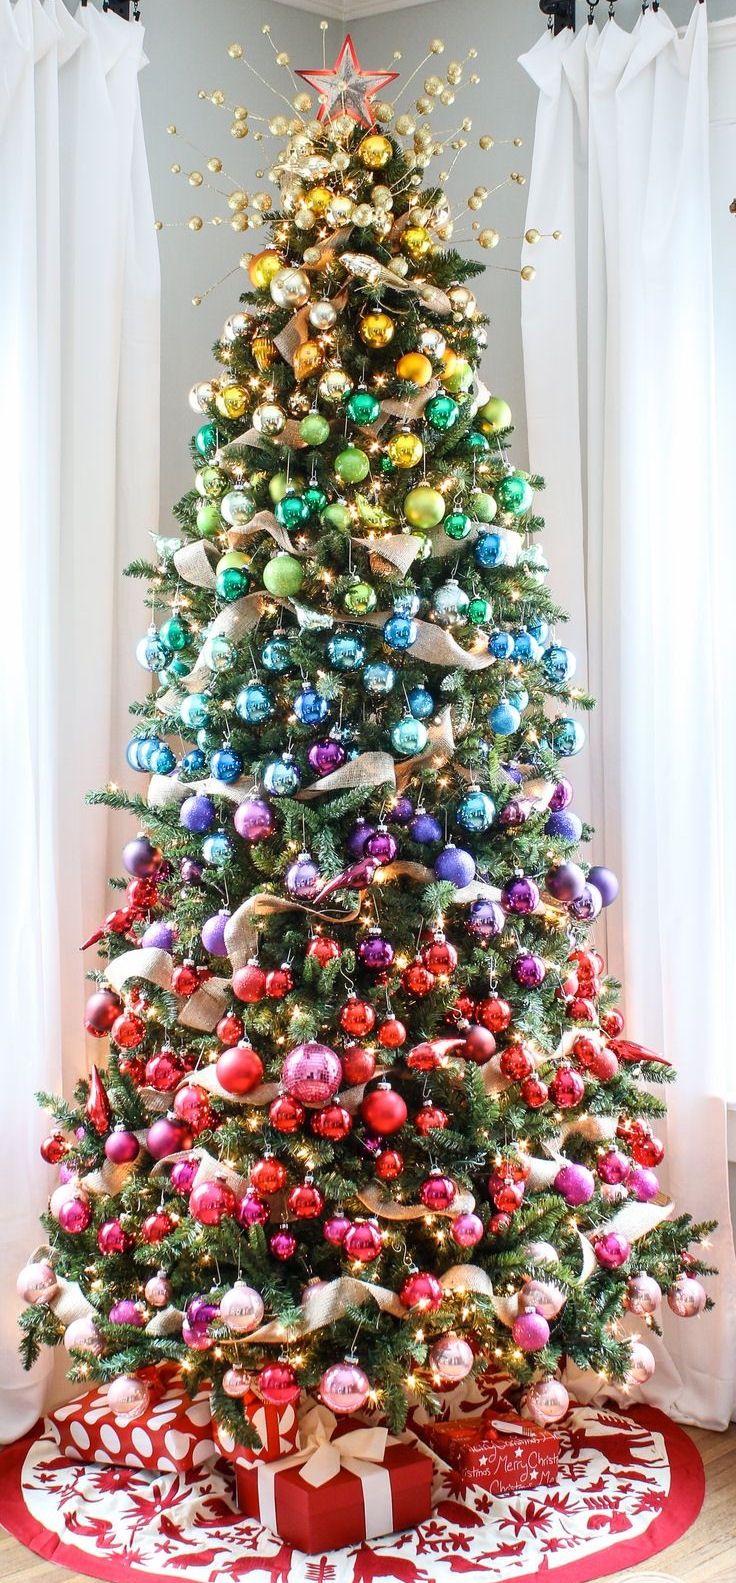 Christmas Tree Filled With Christmas Balls Christmas Christmas Tree Christmas Ornaments Christ Rainbows Christmas Colorful Christmas Tree Christmas Inspiration